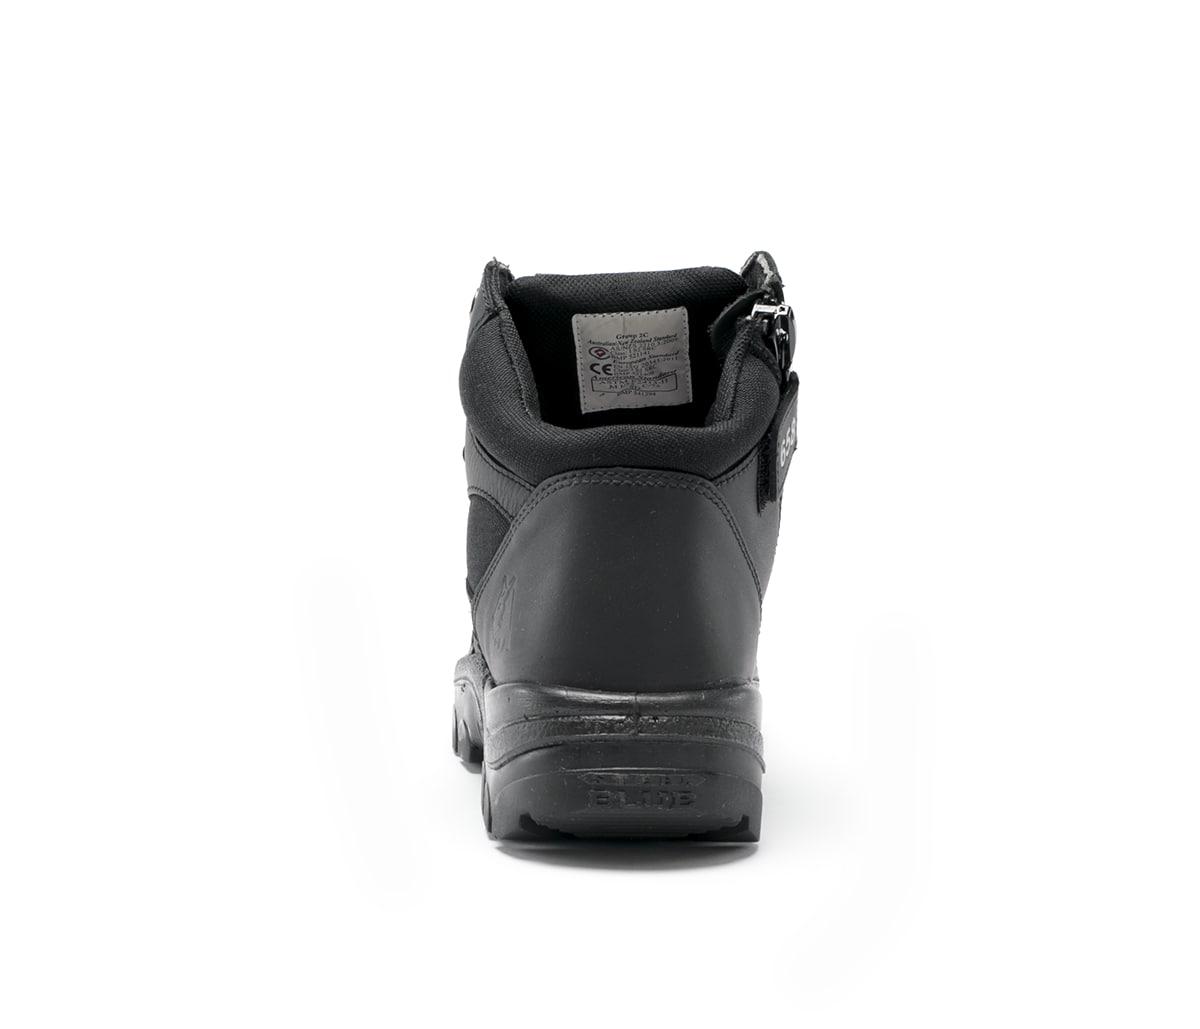 Parkes Zip: Scuff Cap - Black